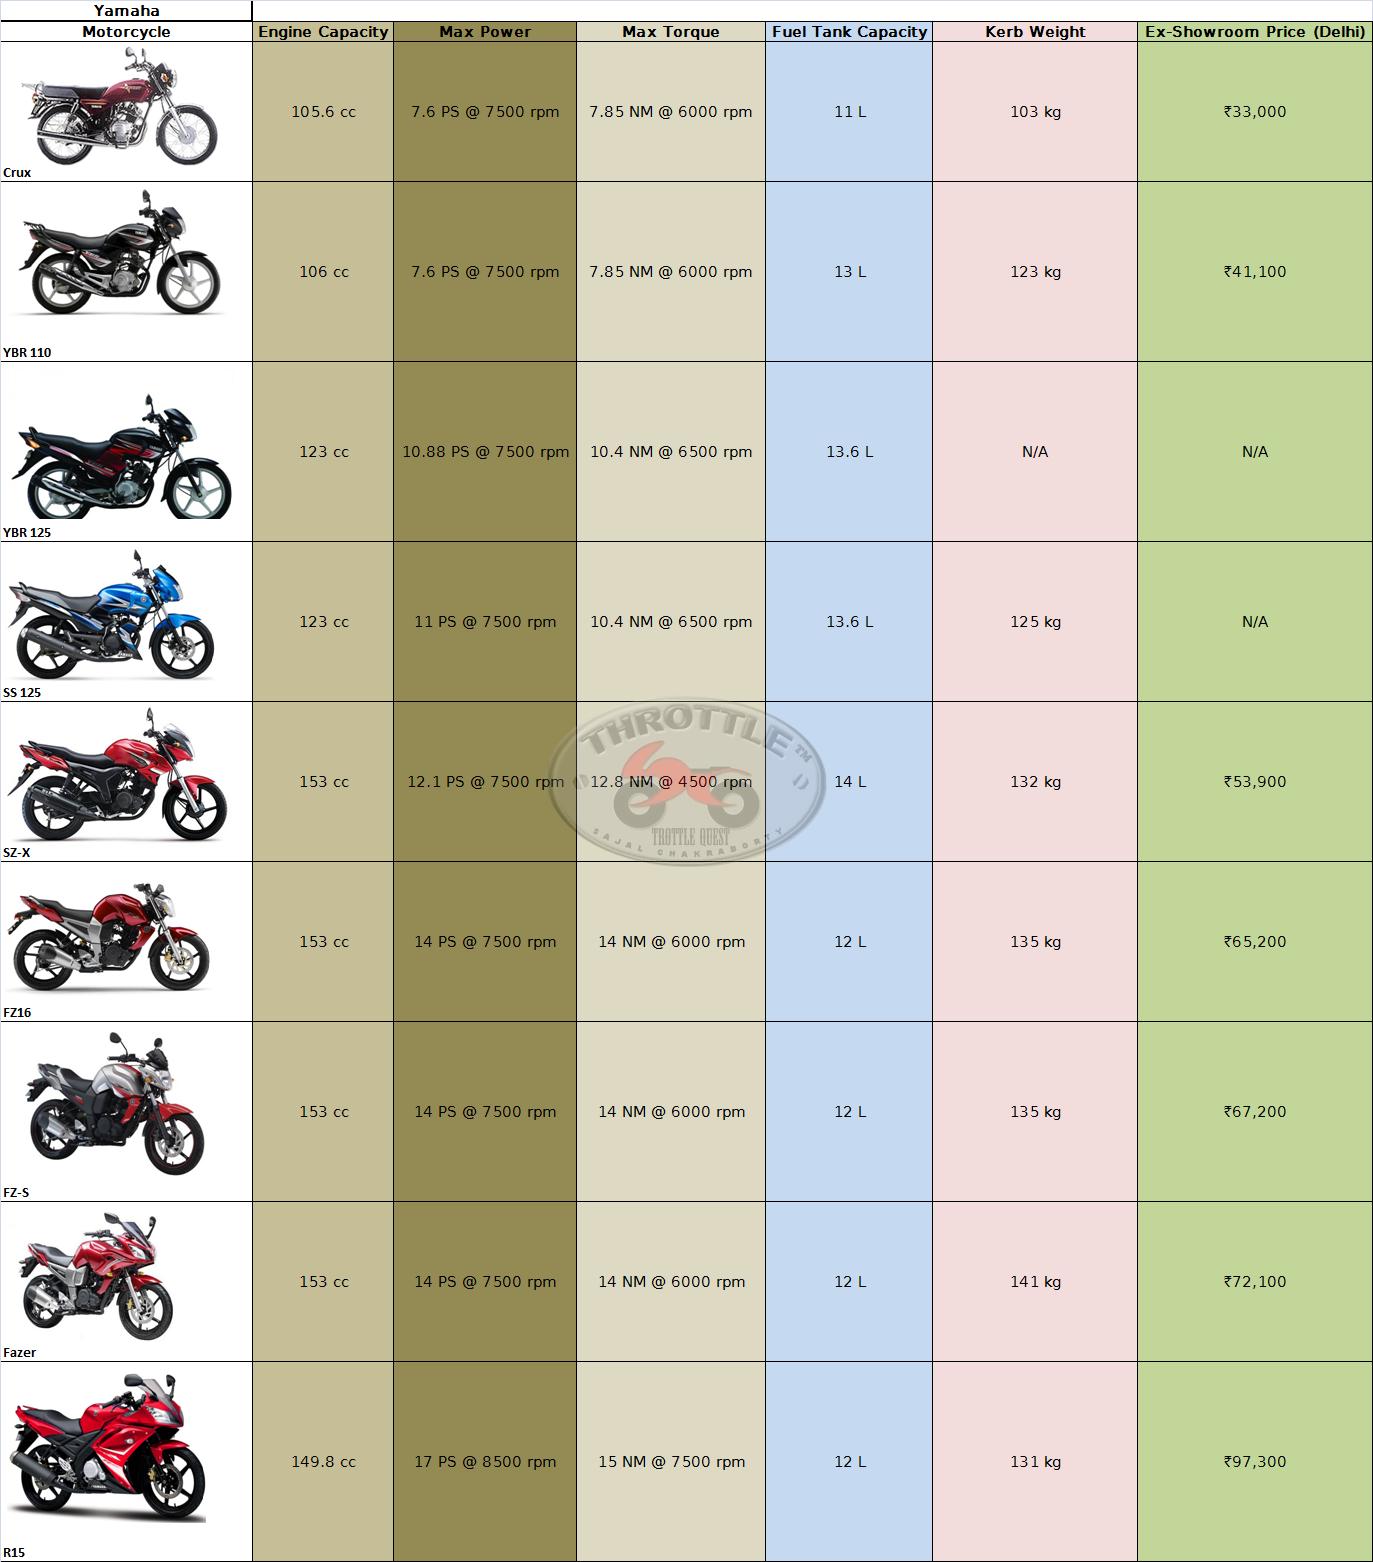 Price List of Yamaha Motorcycle Philippines Yamaha Motorcycles Price List